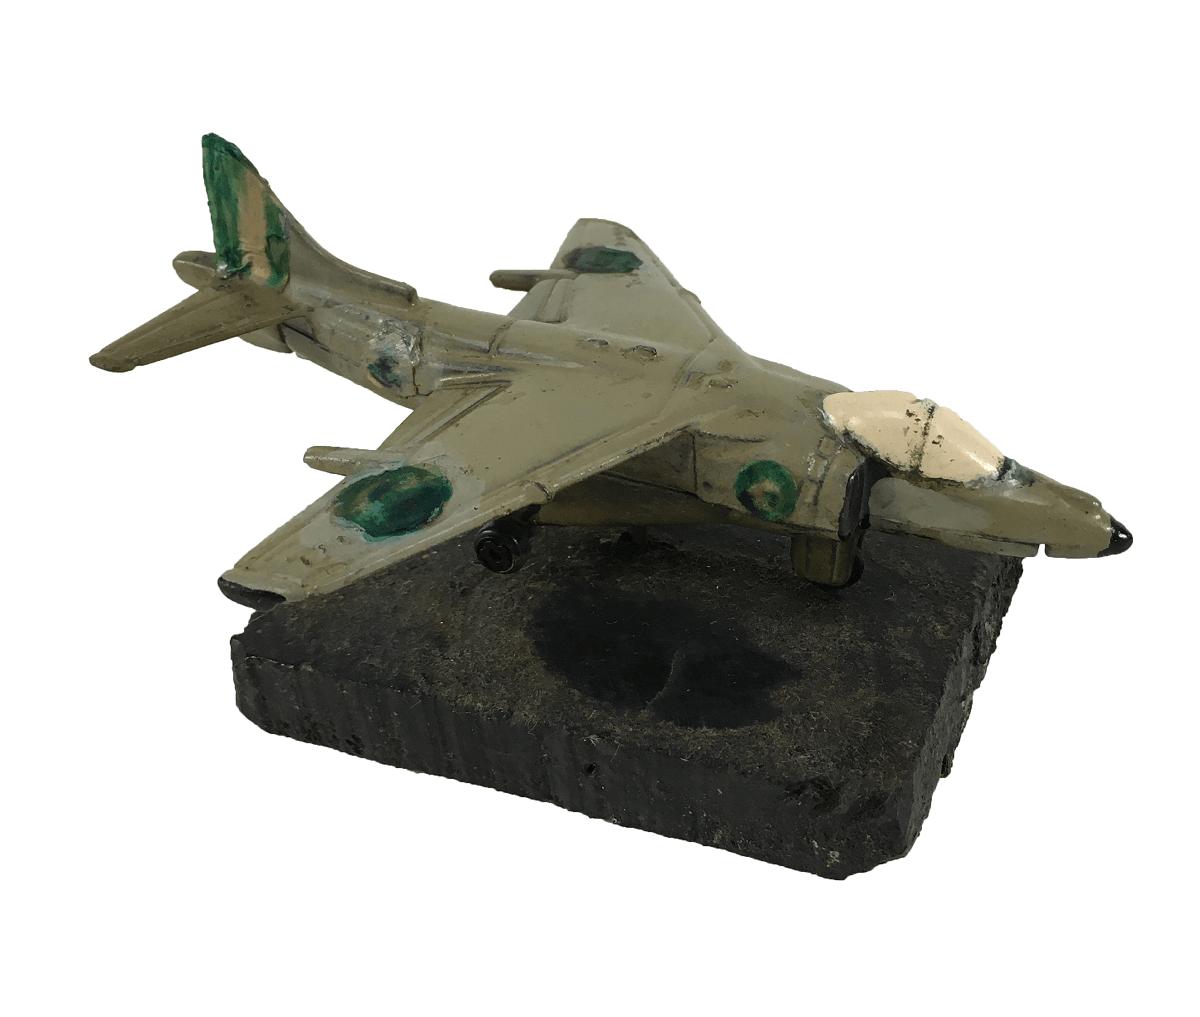 Miniatura Aviao FAB Metal Base Madeira